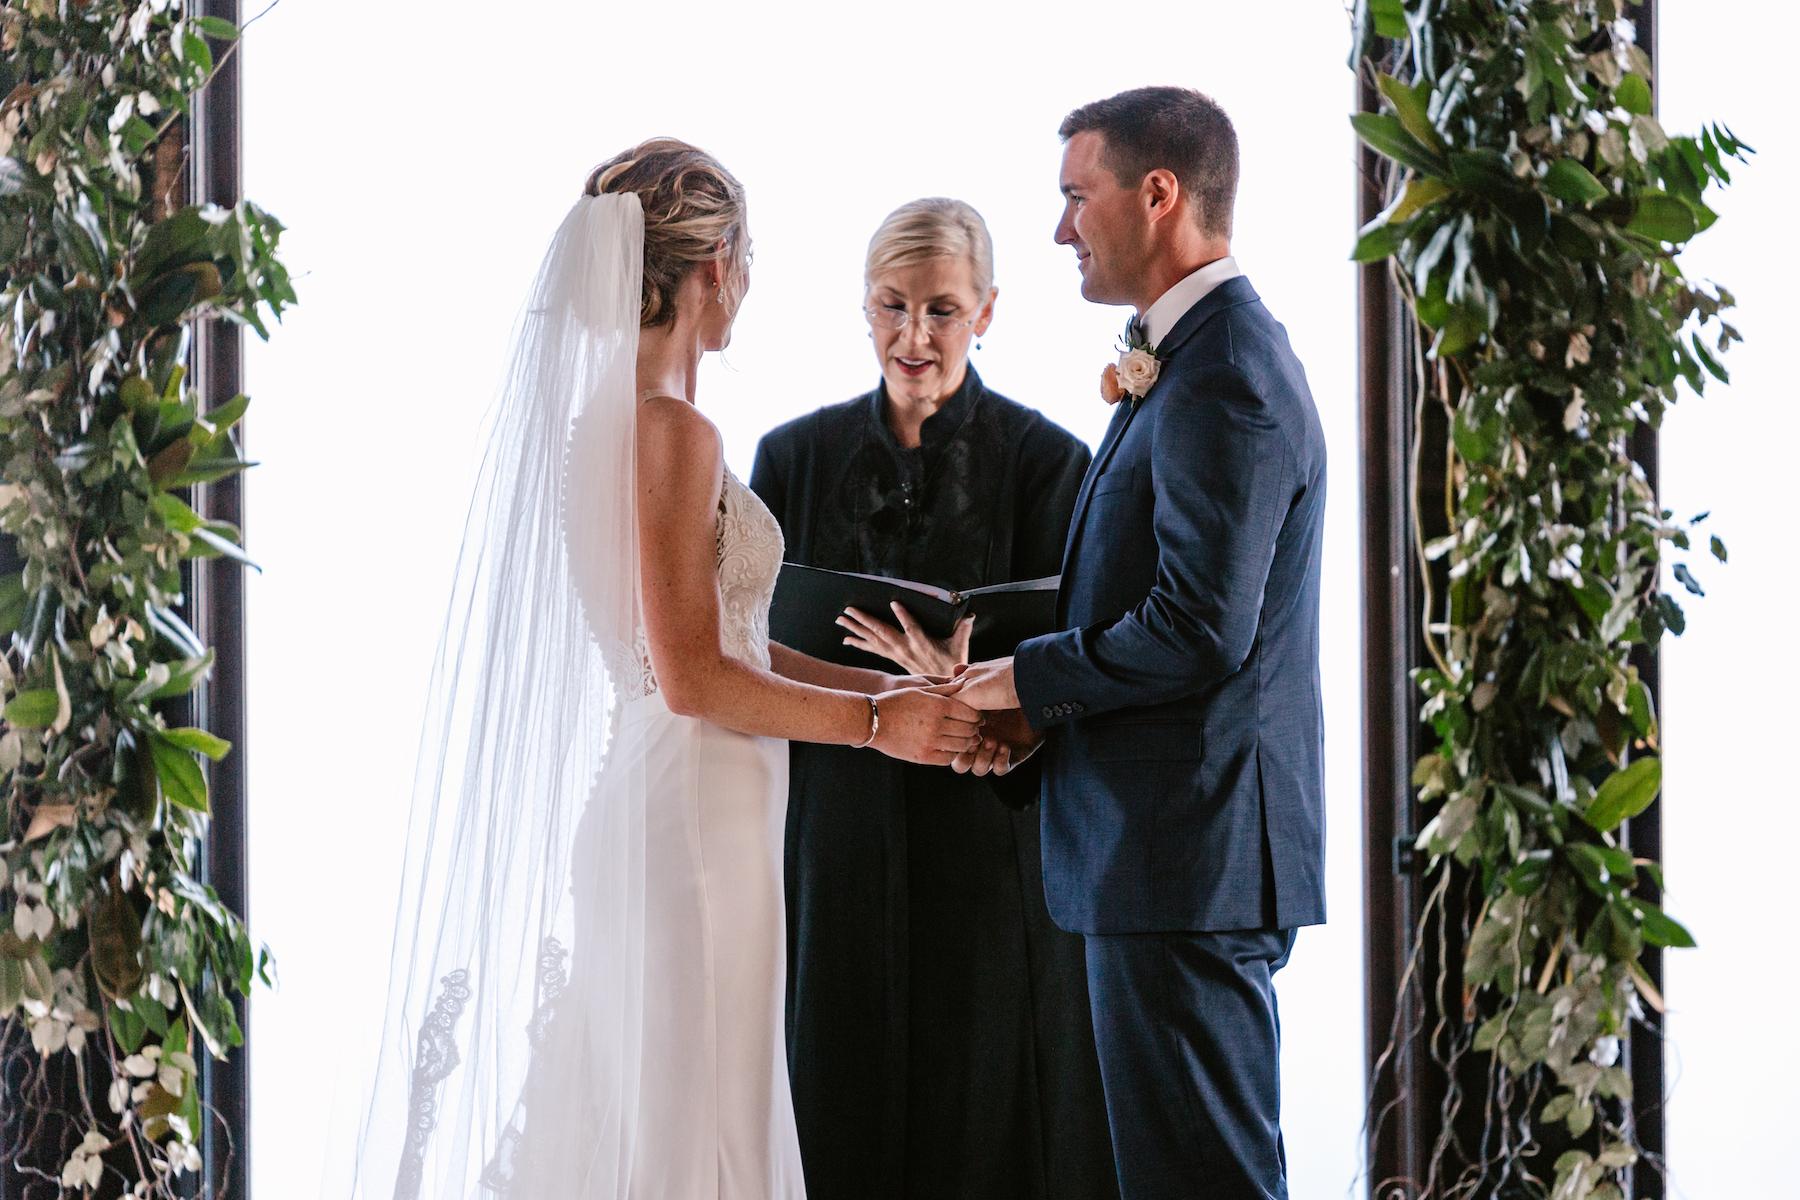 wedding-engagement-photographer-spartanburg-greenville-columbia-carolina-south-north-496.JPG